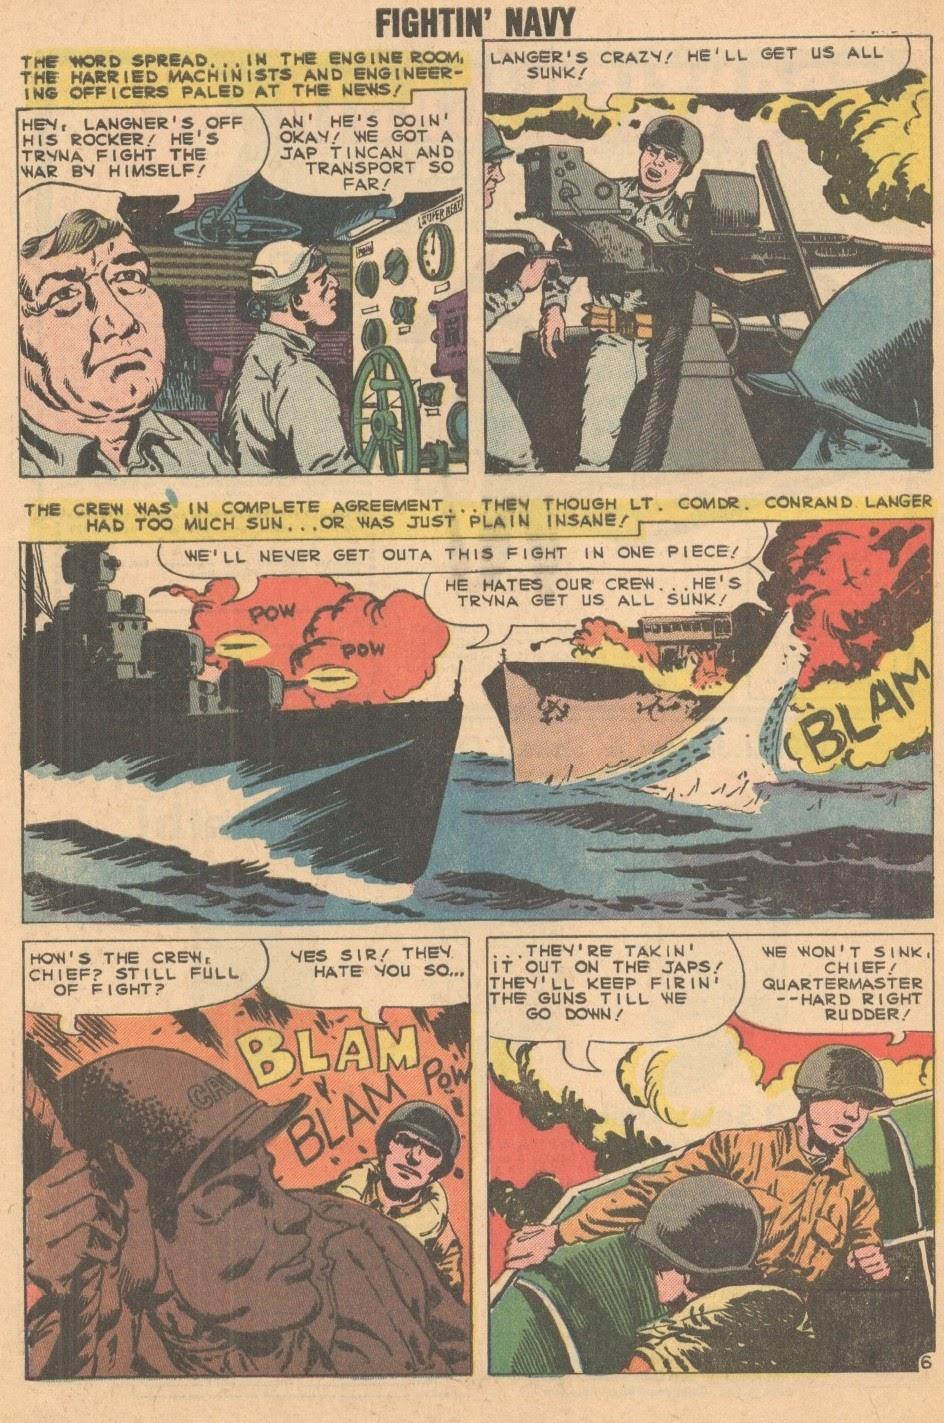 Read online Fightin' Navy comic -  Issue #93 - 32